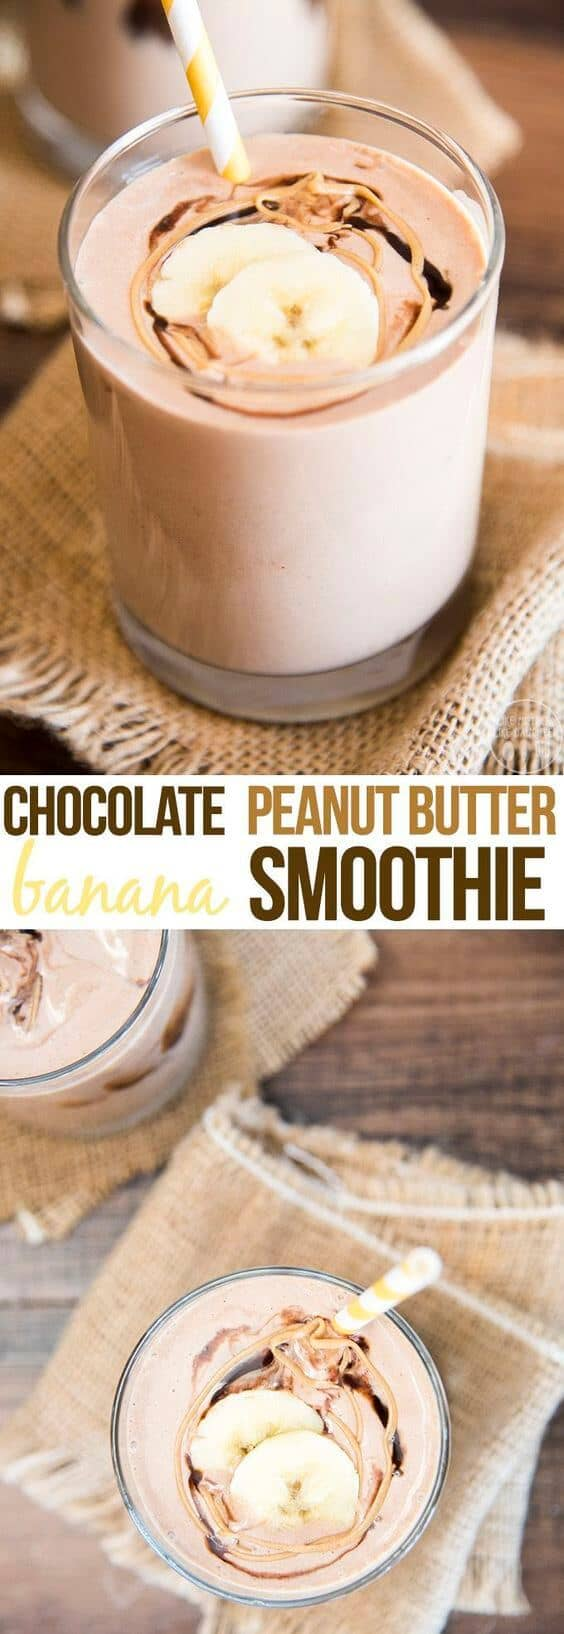 Breakfast Peanut Butter Chocolate Banana Smoothie